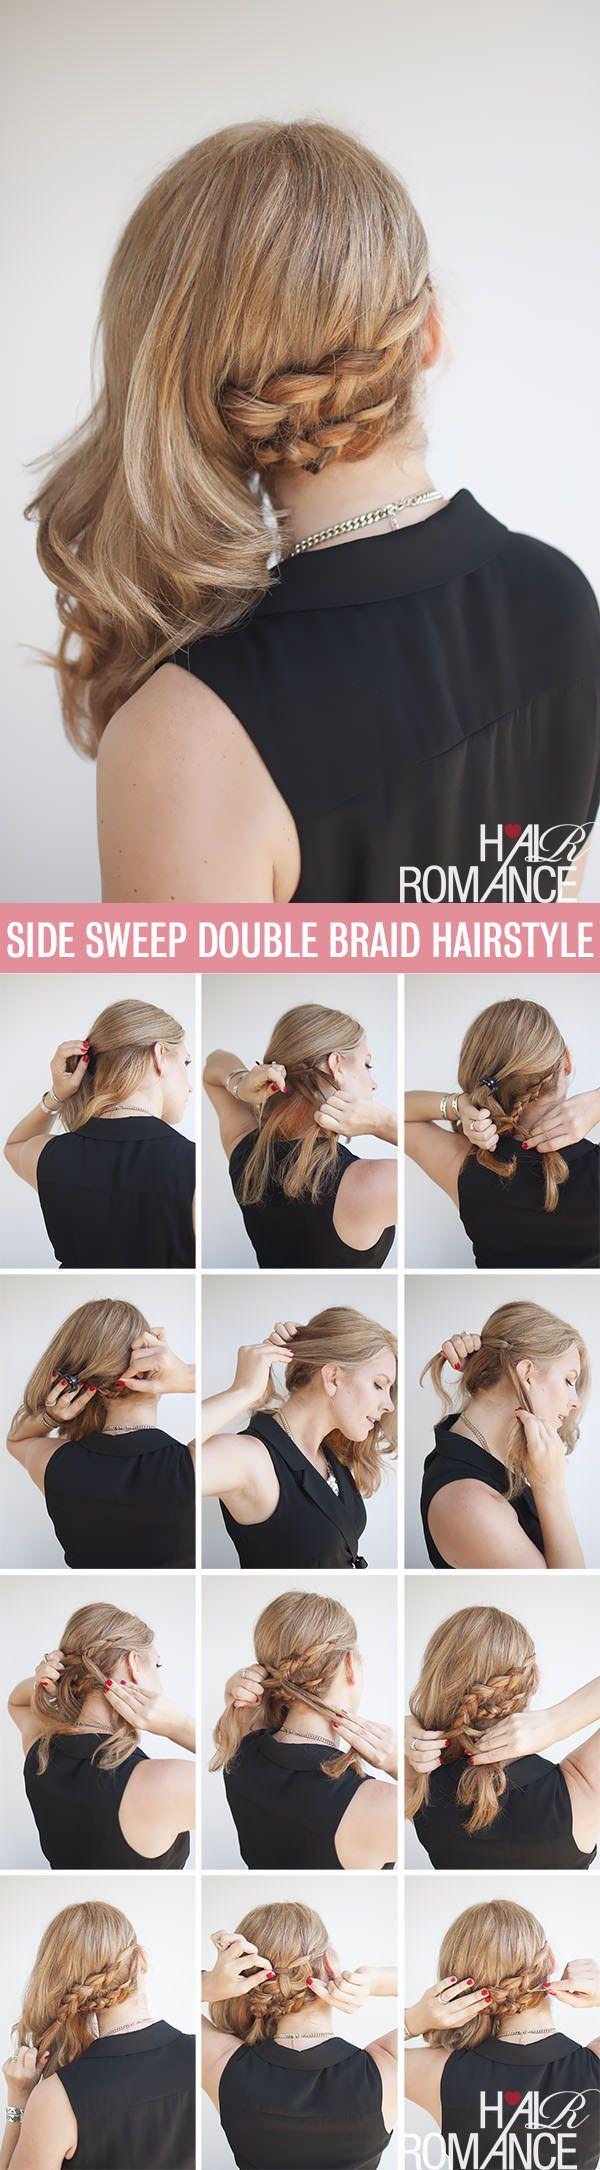 Side Sweep Double Braid